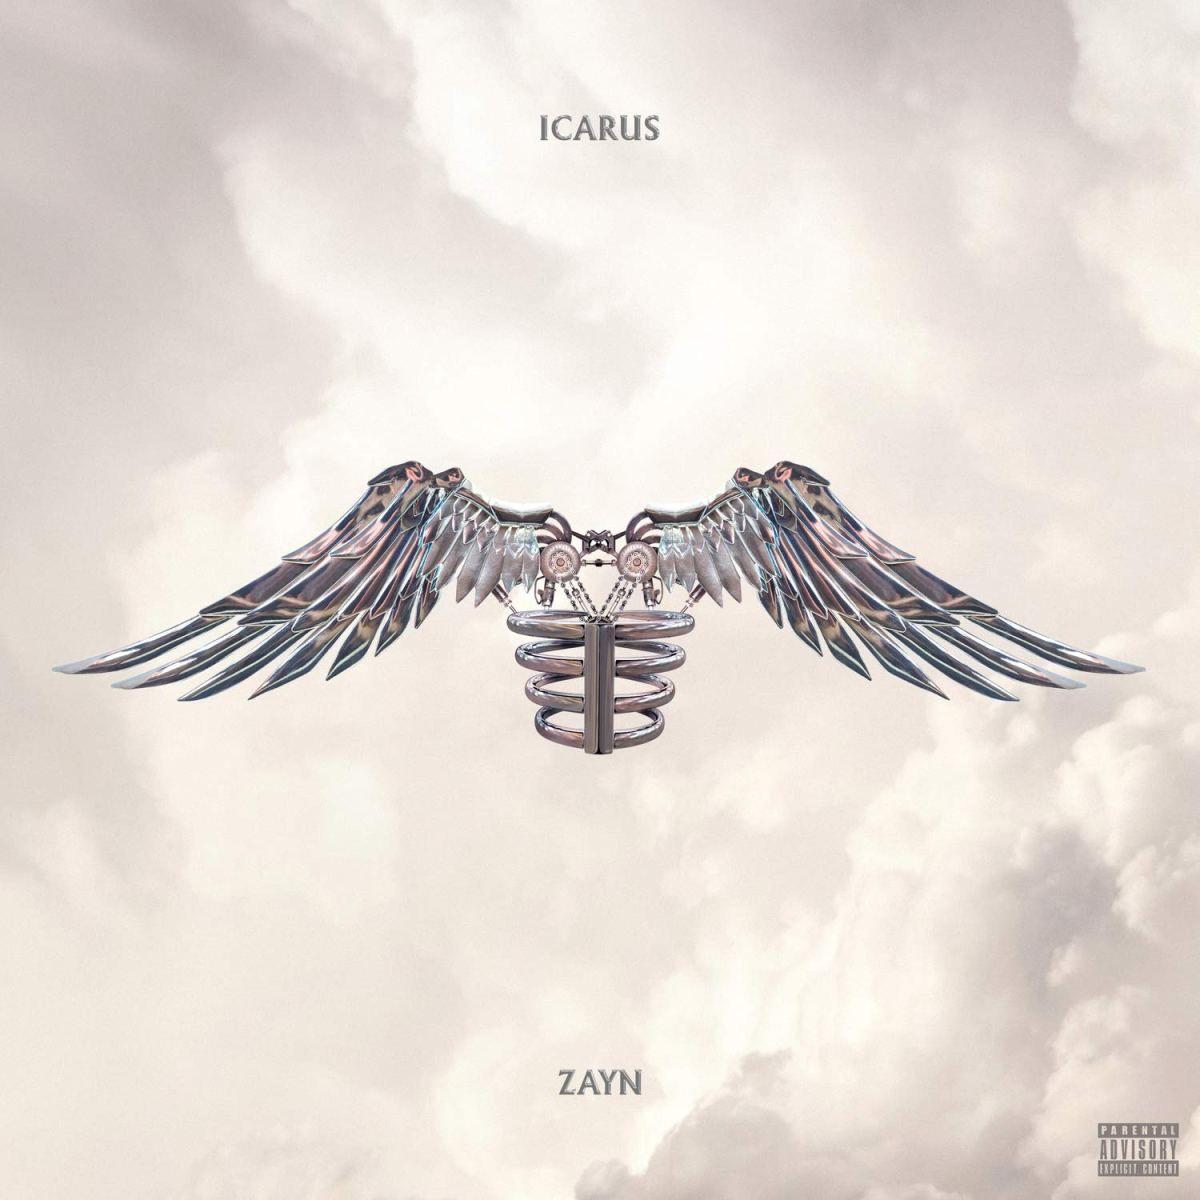 ZAYN Icarus Falls lbum musical Produo de arte Album 1200x1200